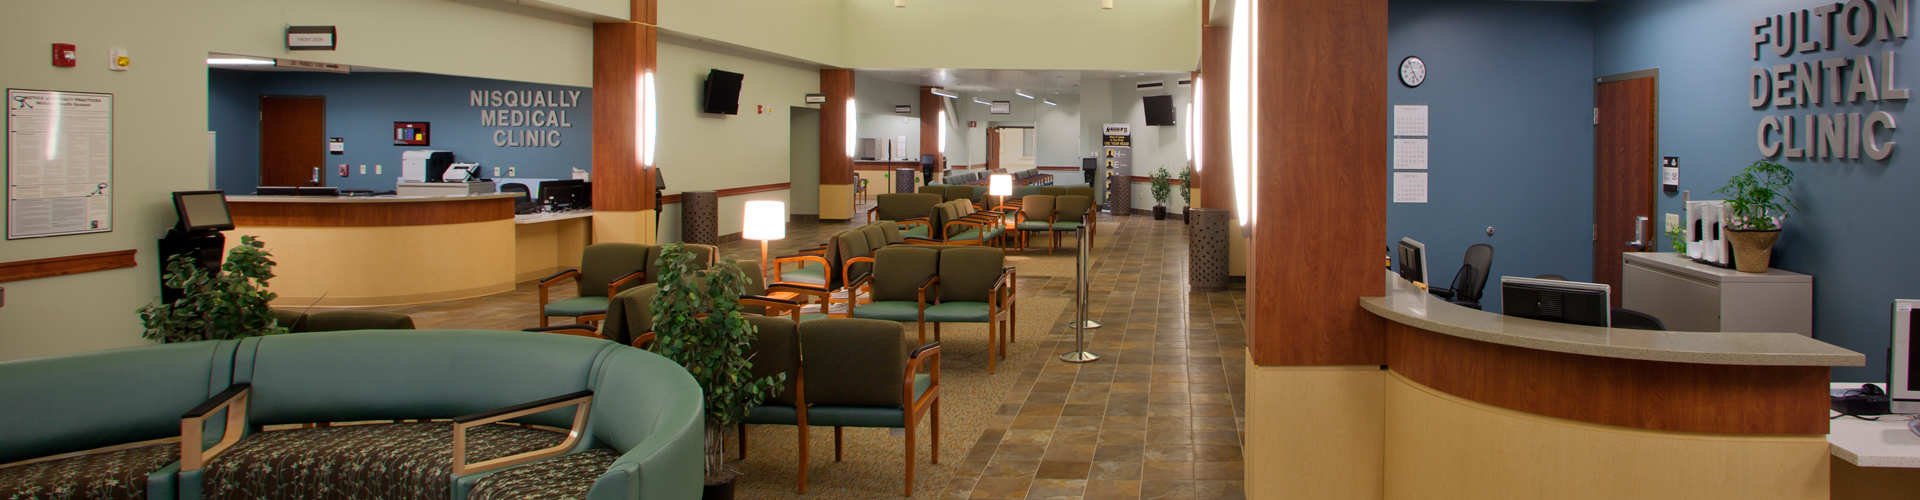 3 Traits Of Smarter Hospital Design